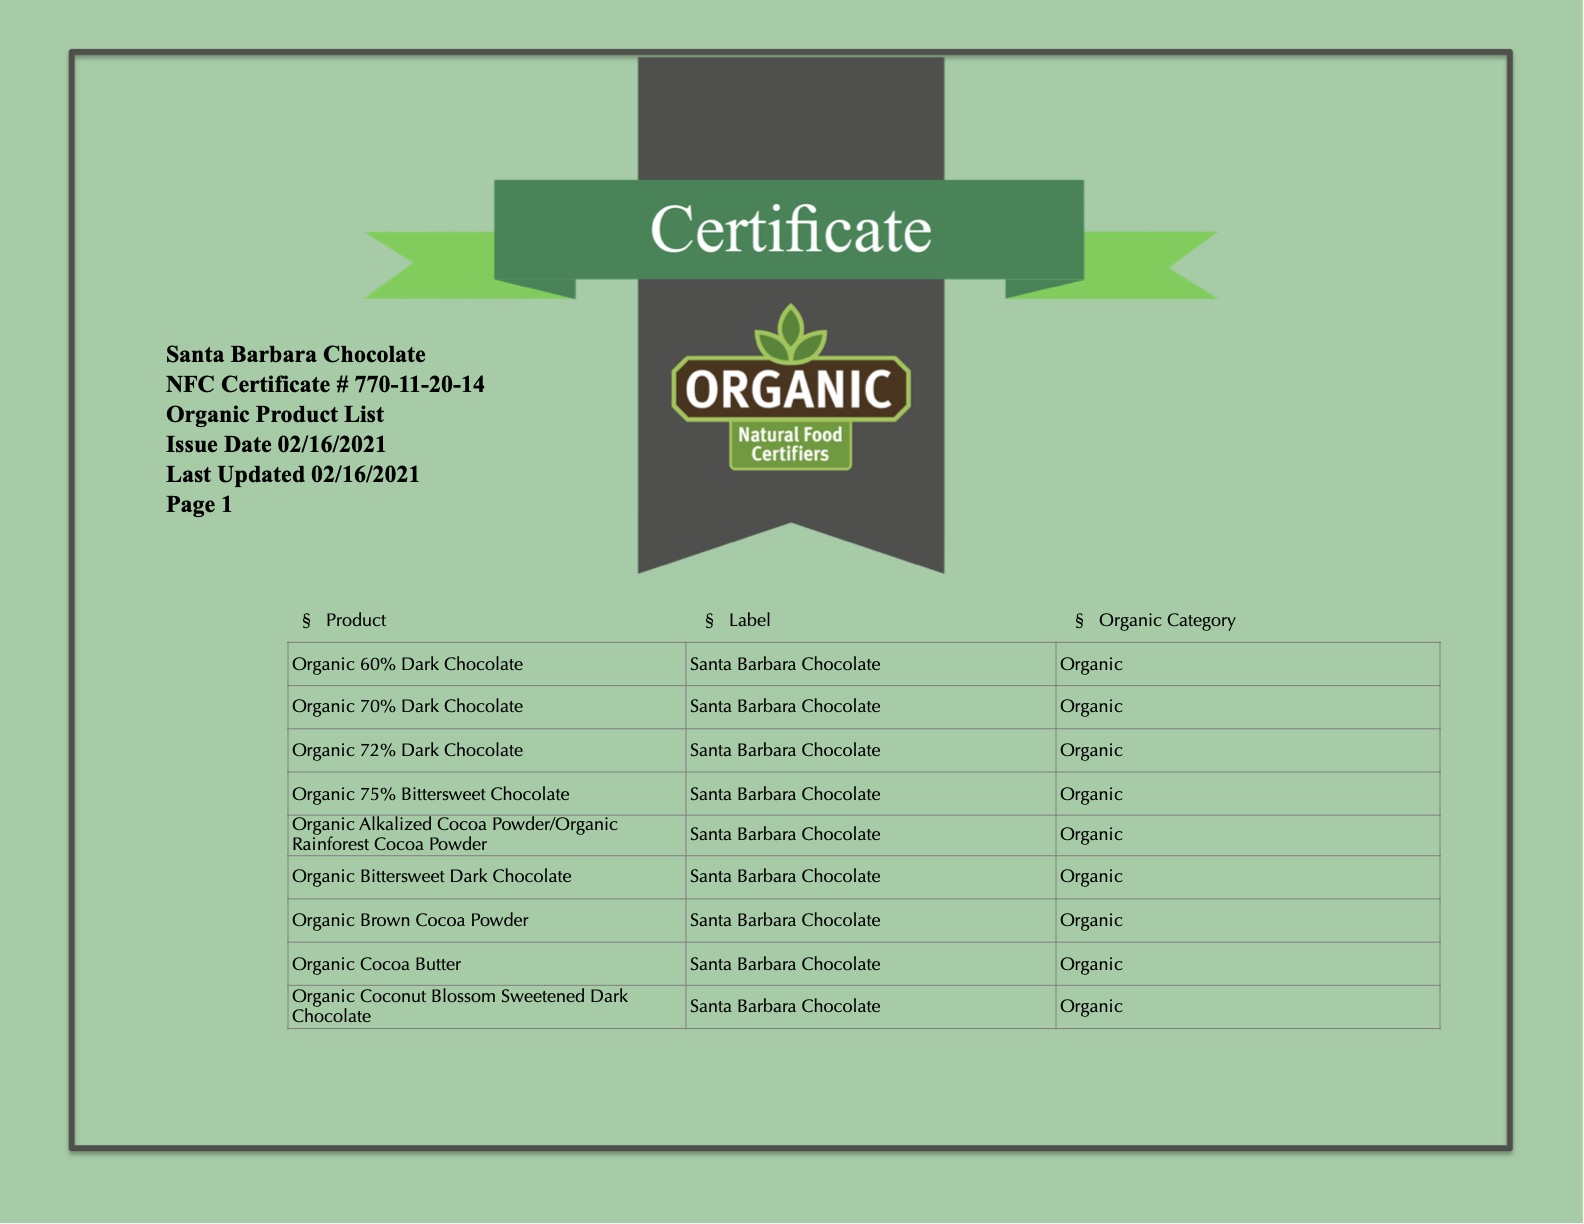 sbc-certificate-2-16-2021signed-1-1.jpg